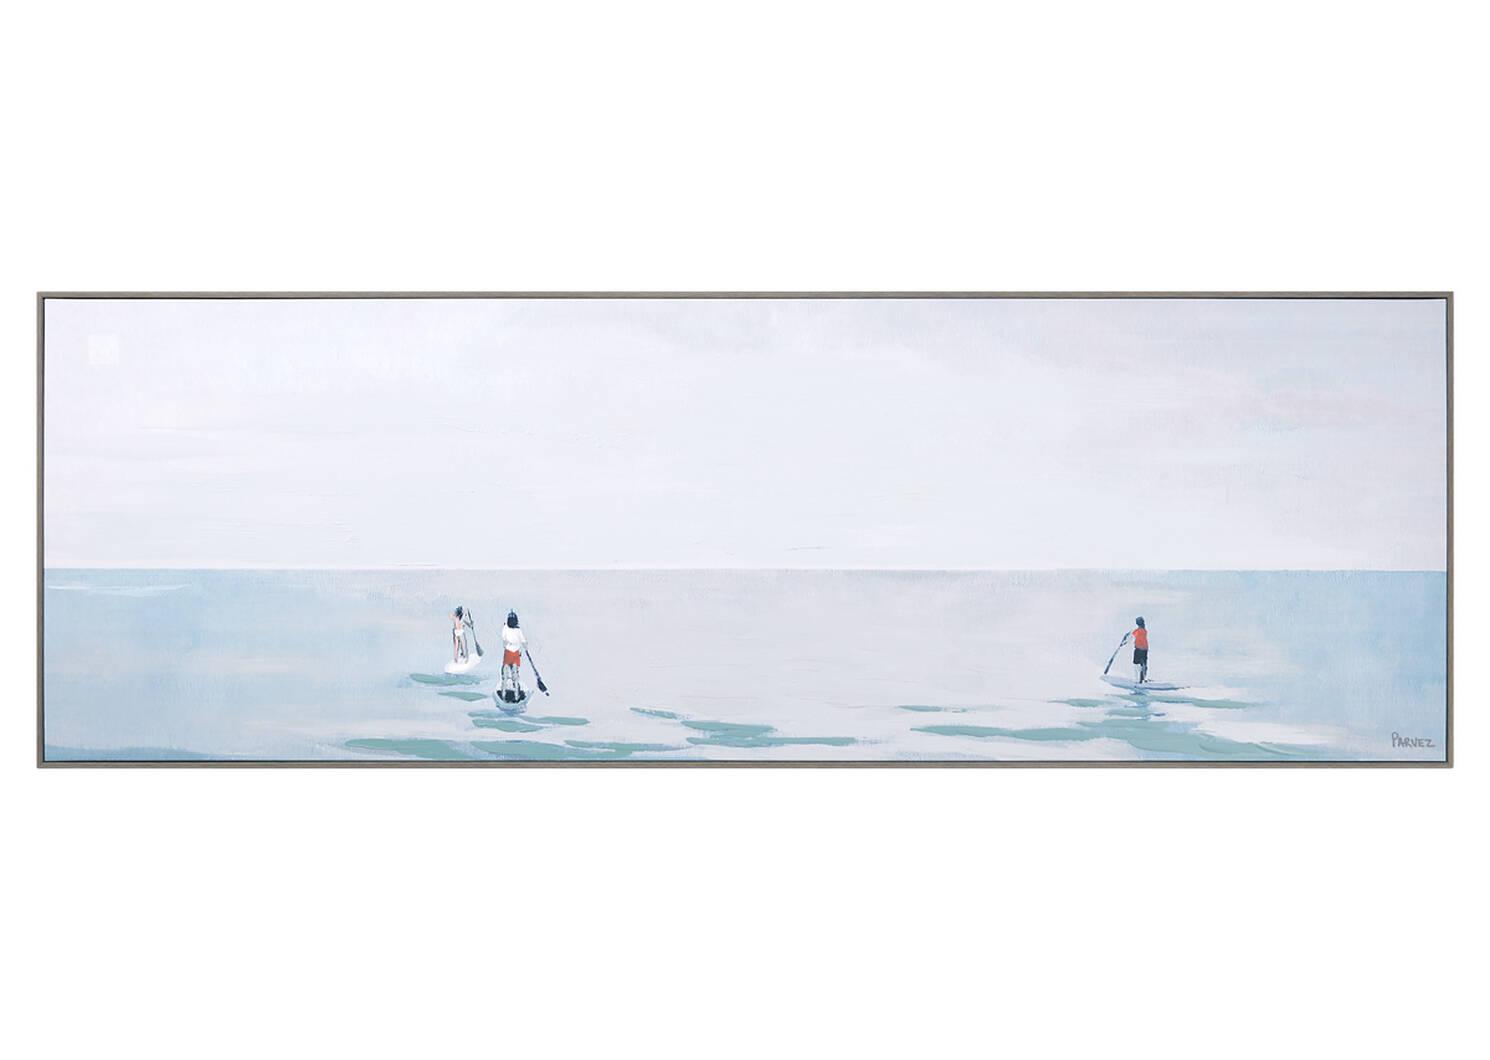 Cruising Wall Art